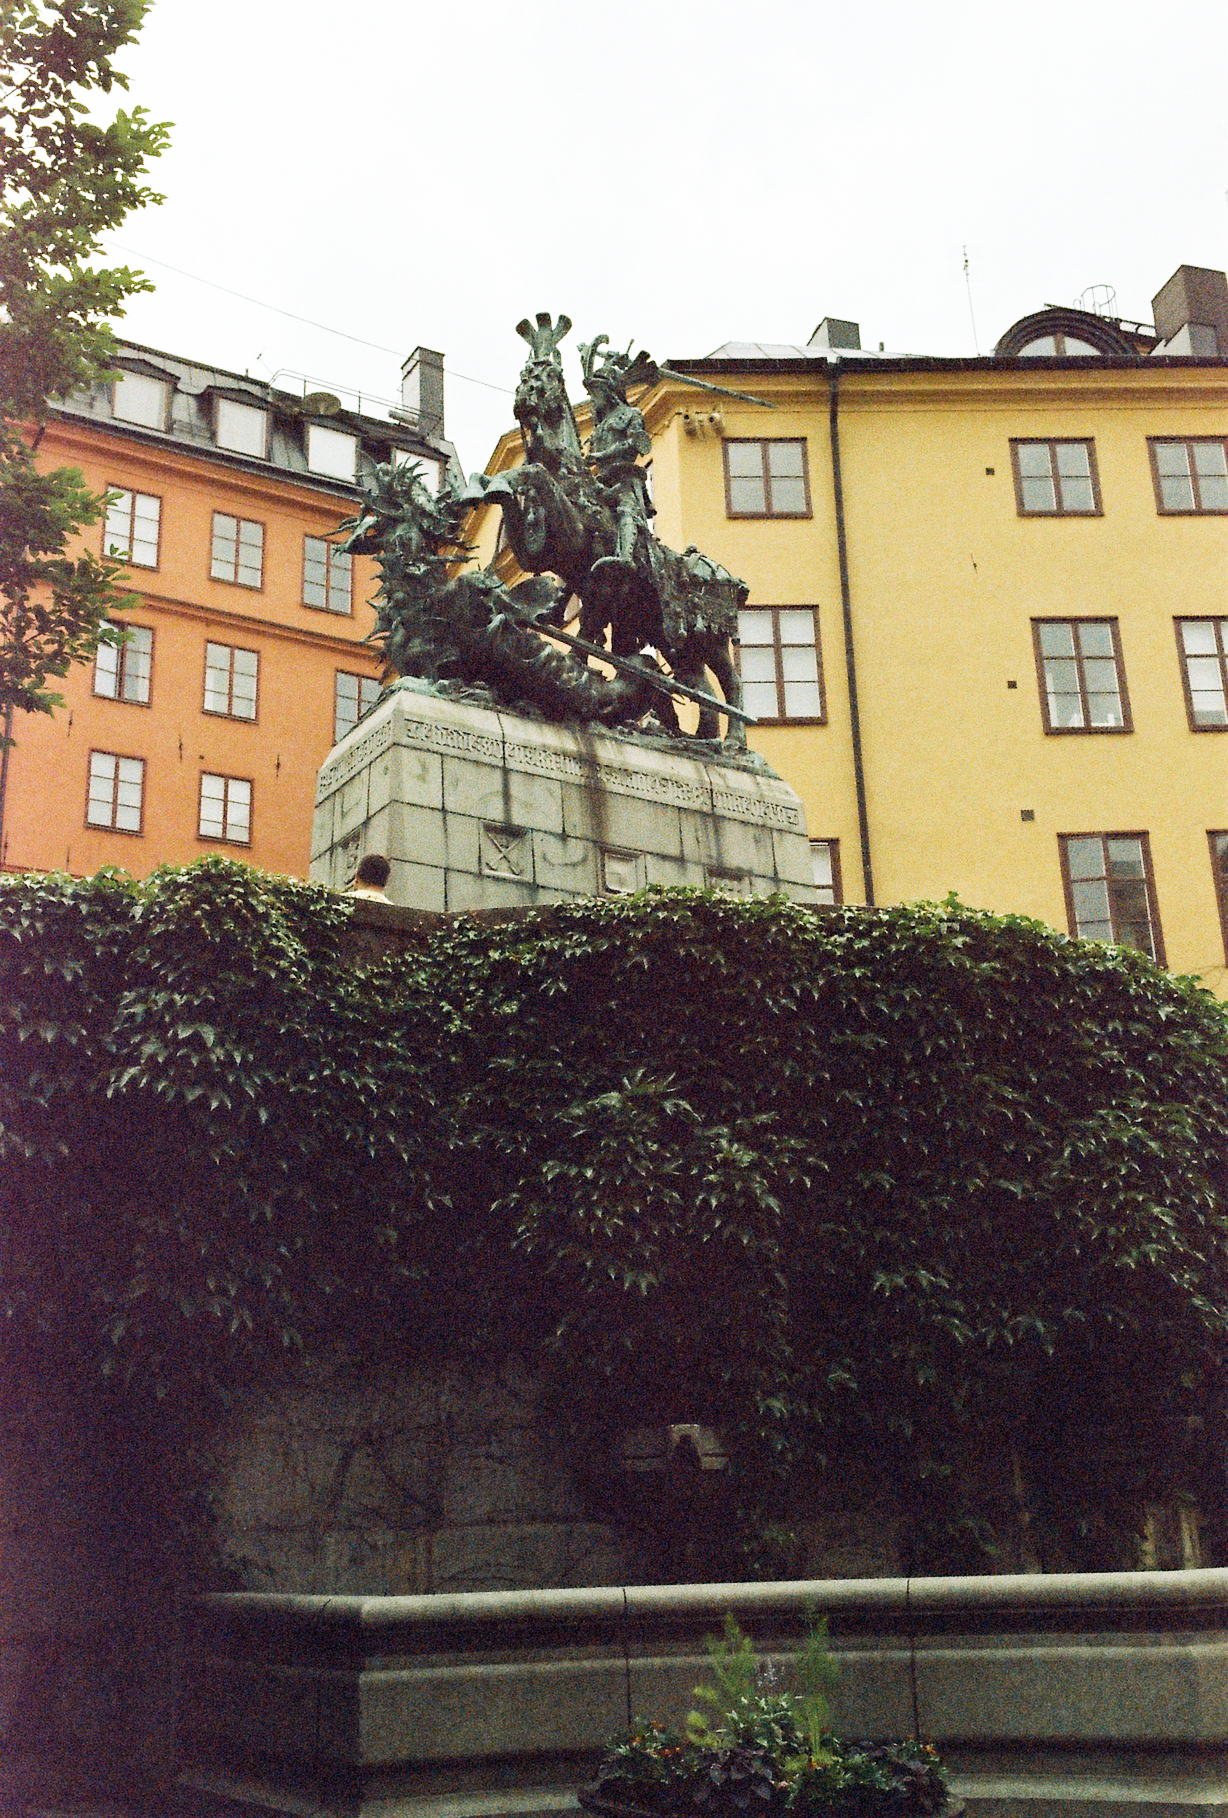 swedish-midsommar-2018-35mm-31.jpg